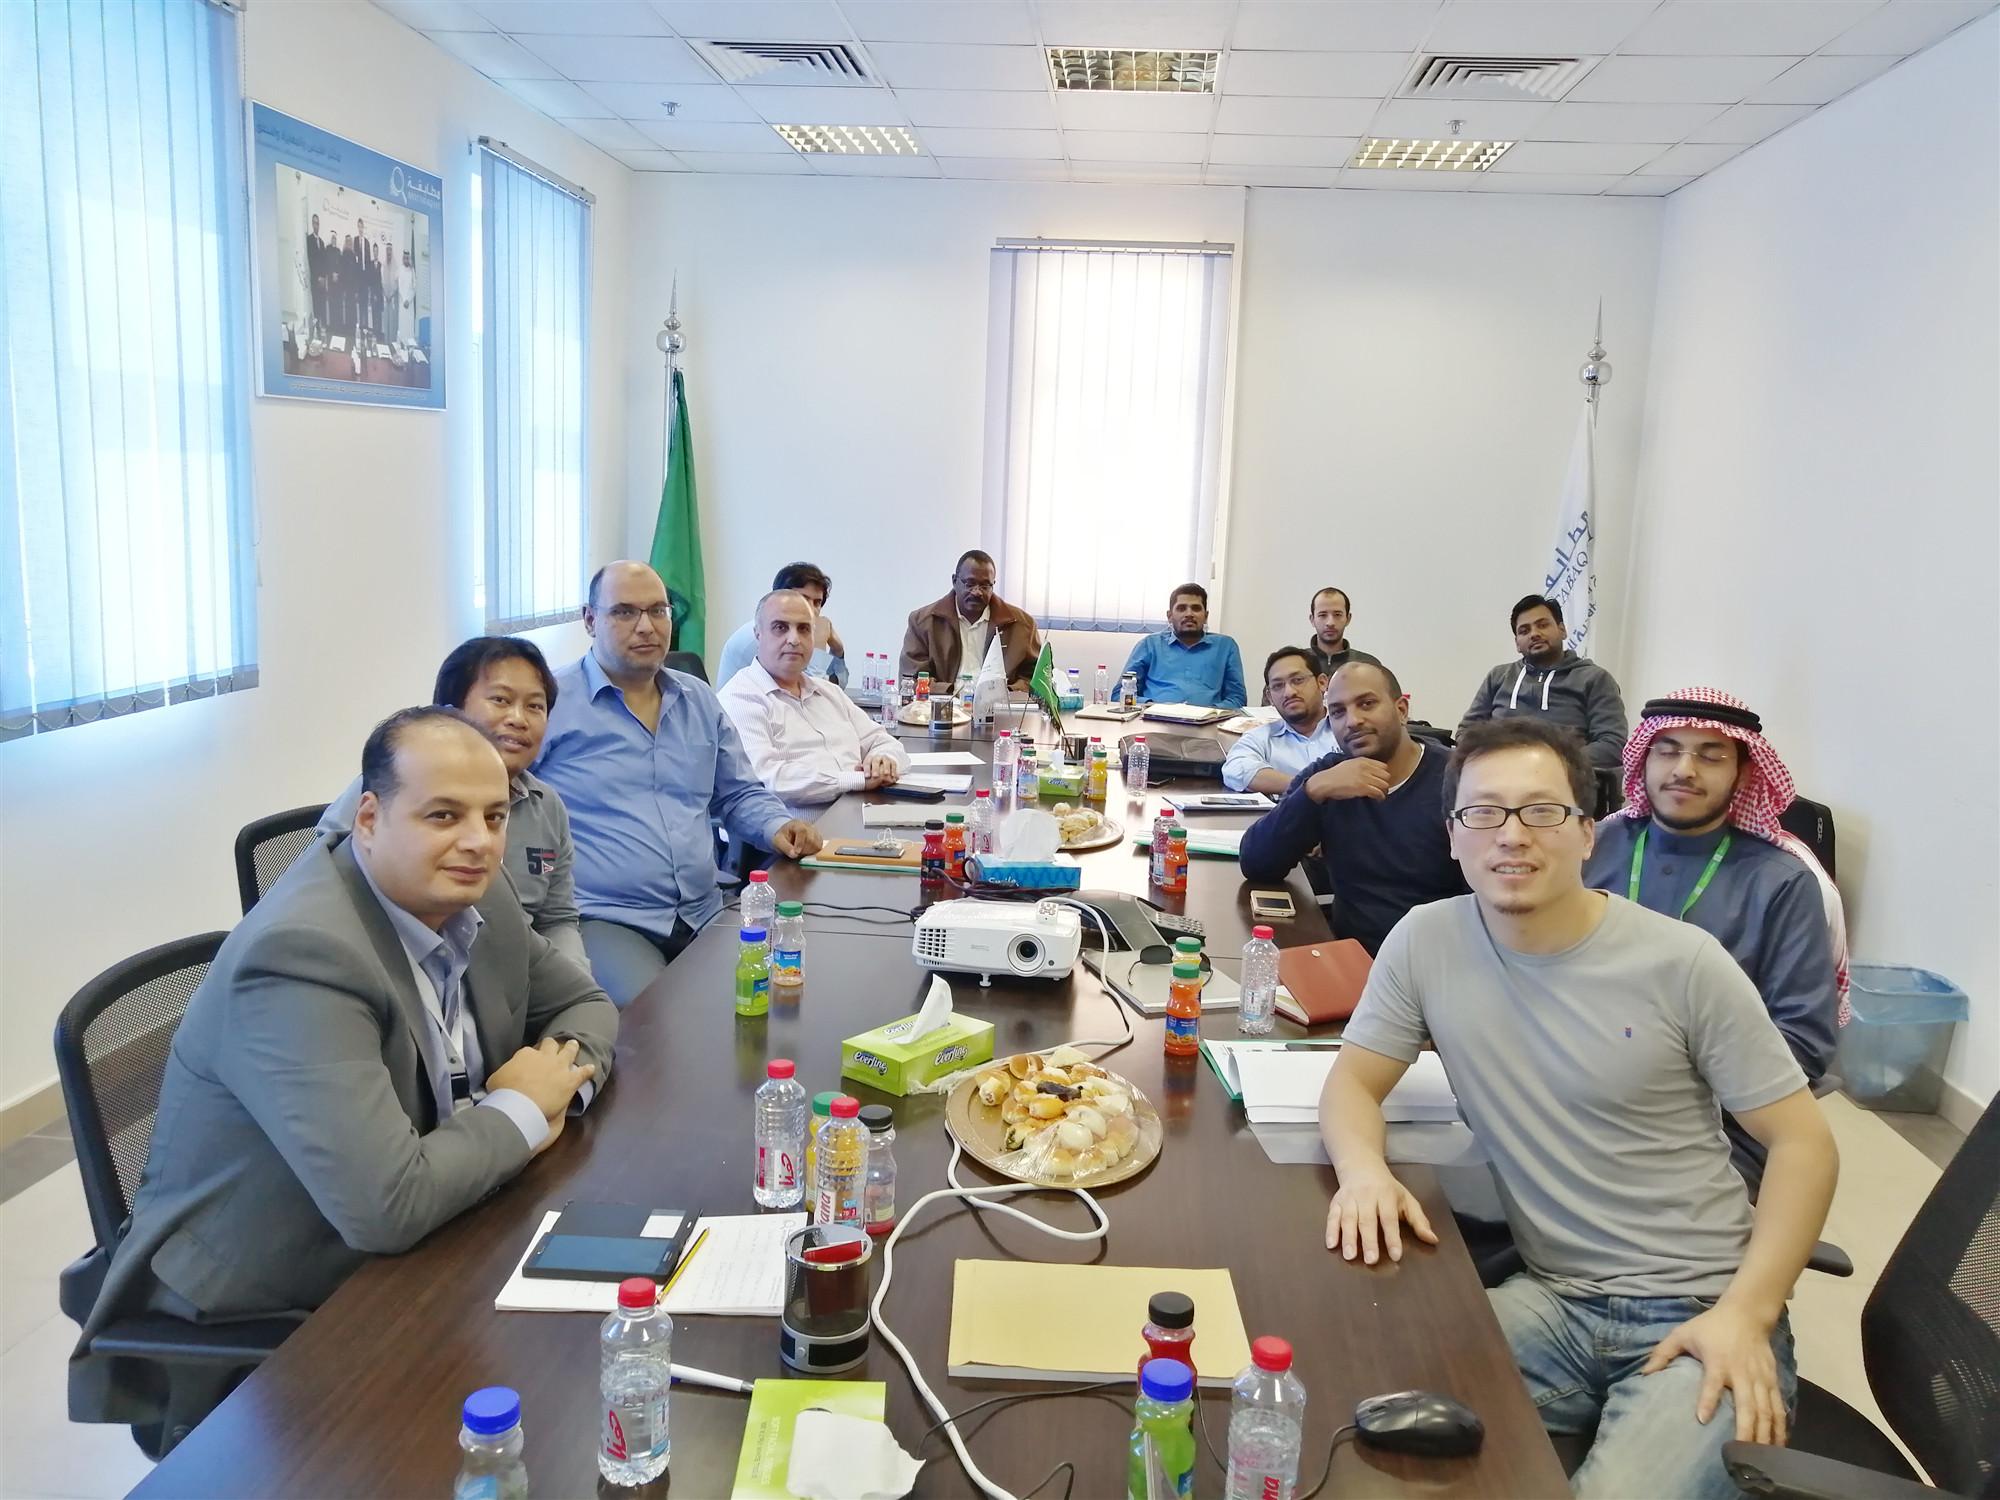 LISUN held a lighting technology salon in Saudi Arabia